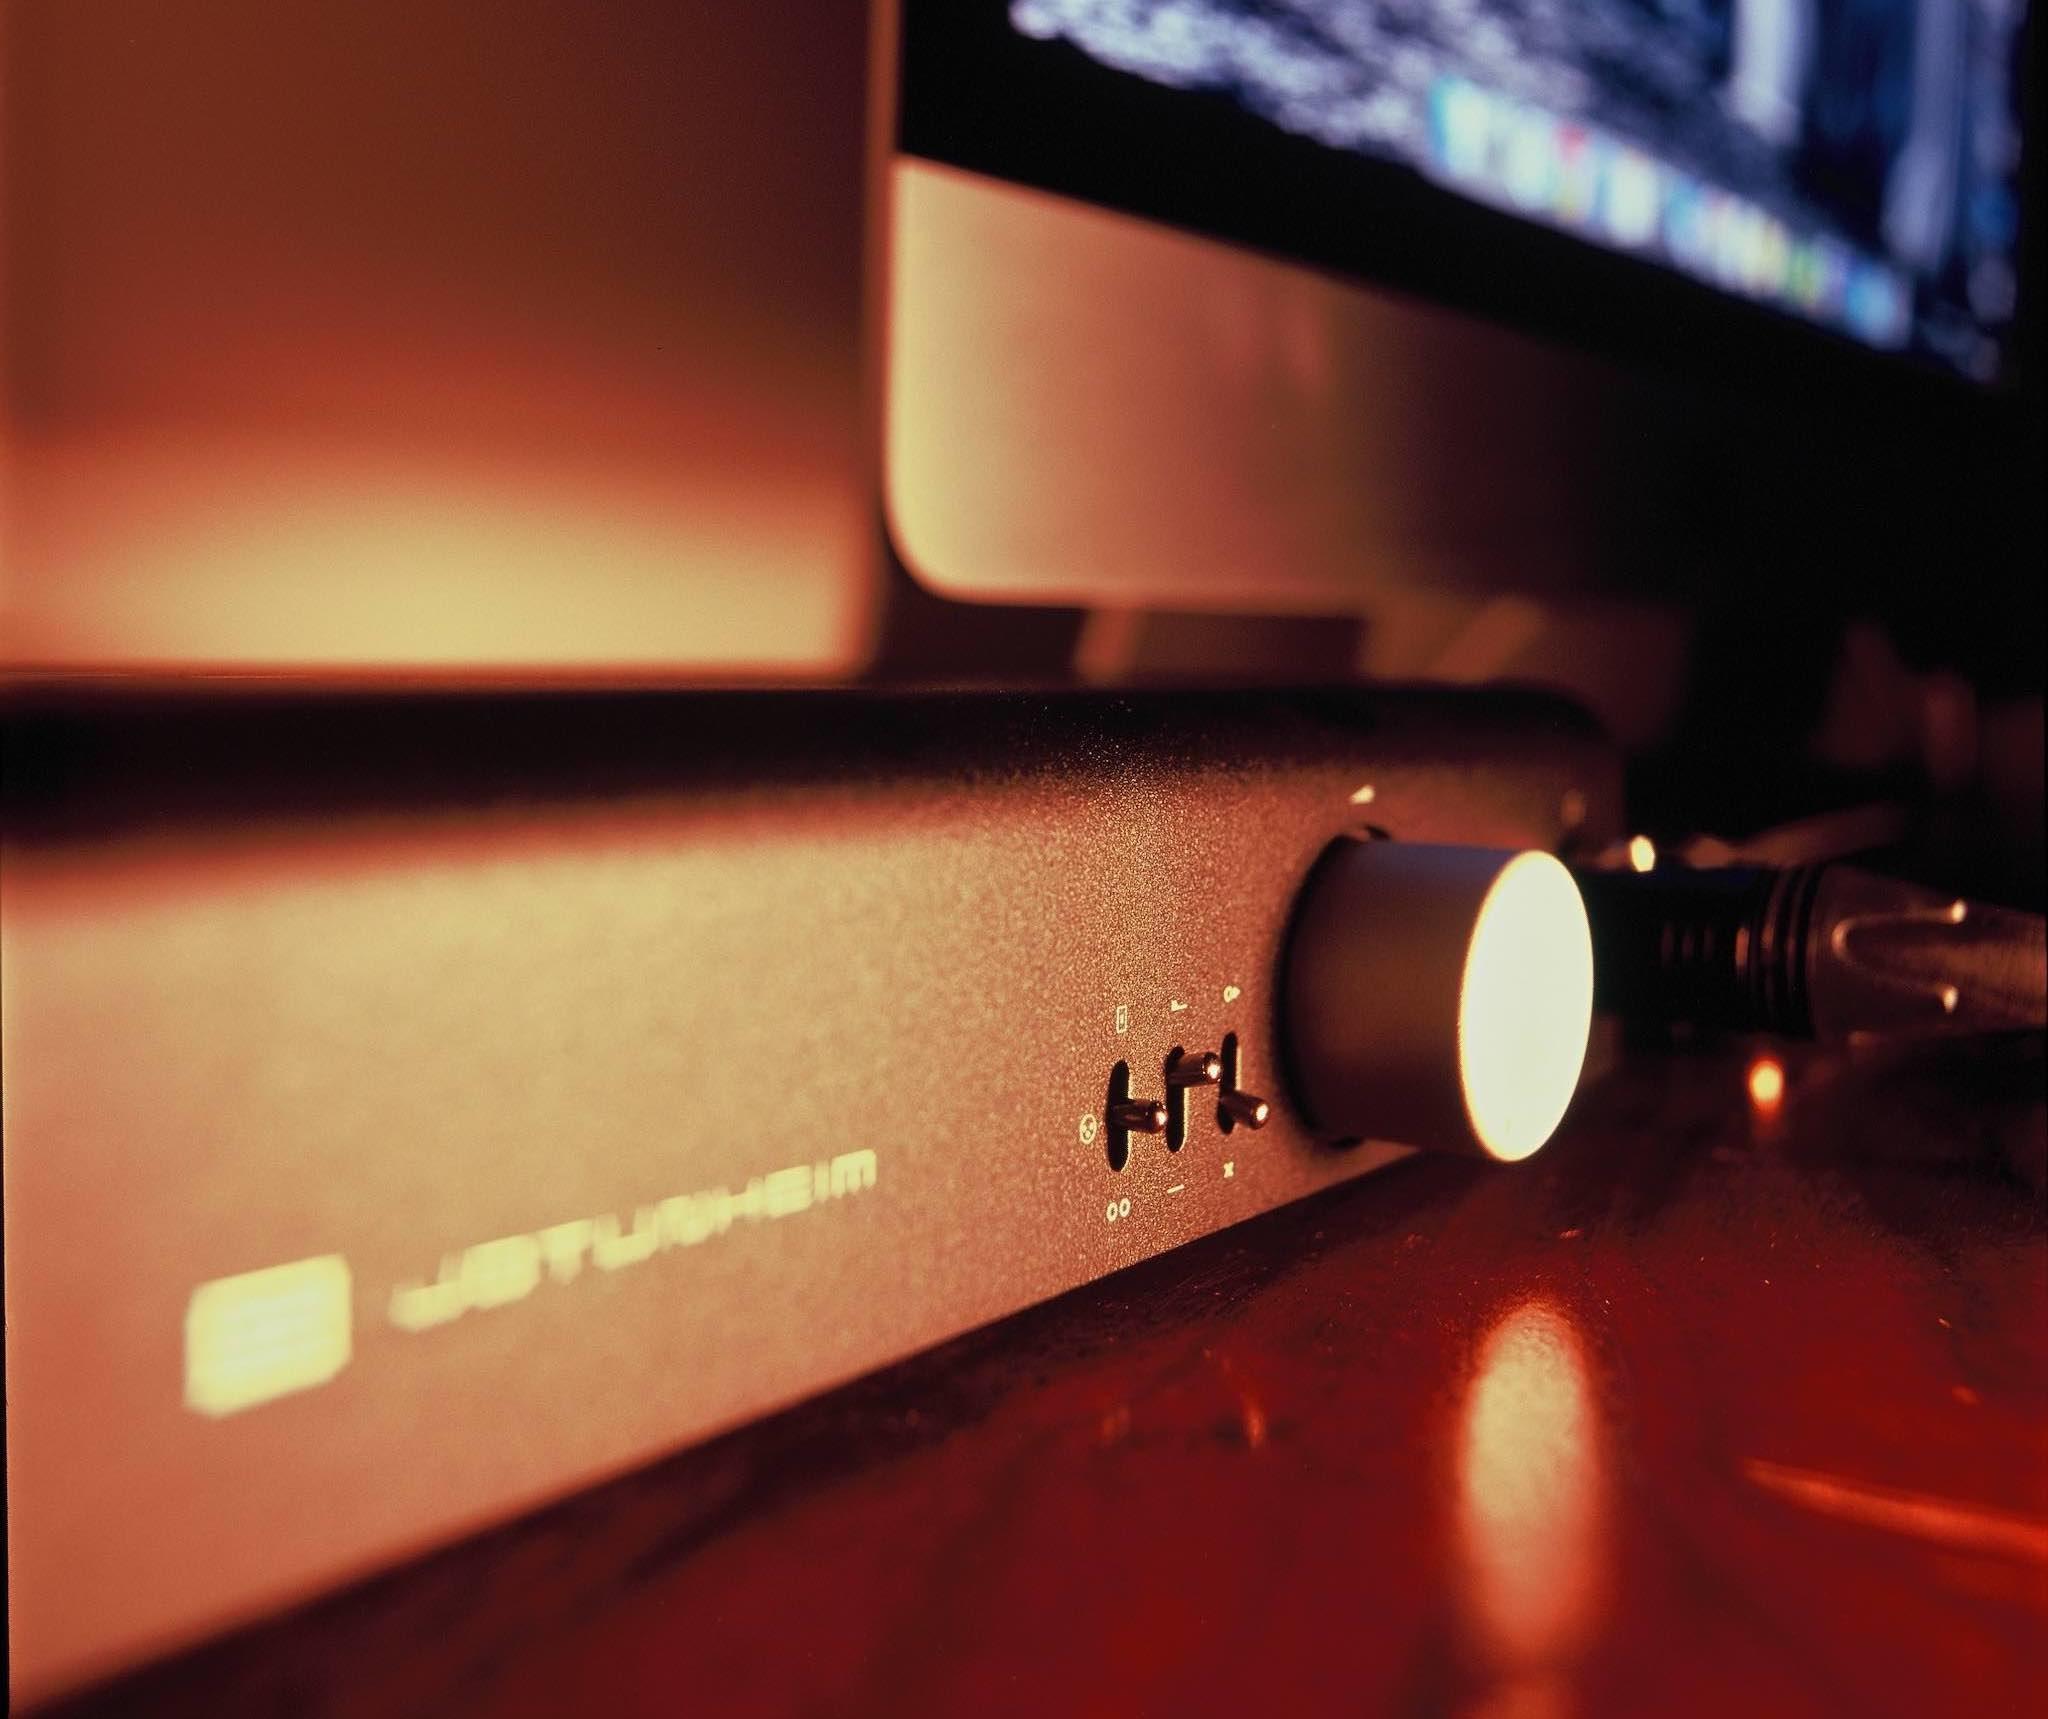 Review | Schiit Audio Jotunheim R